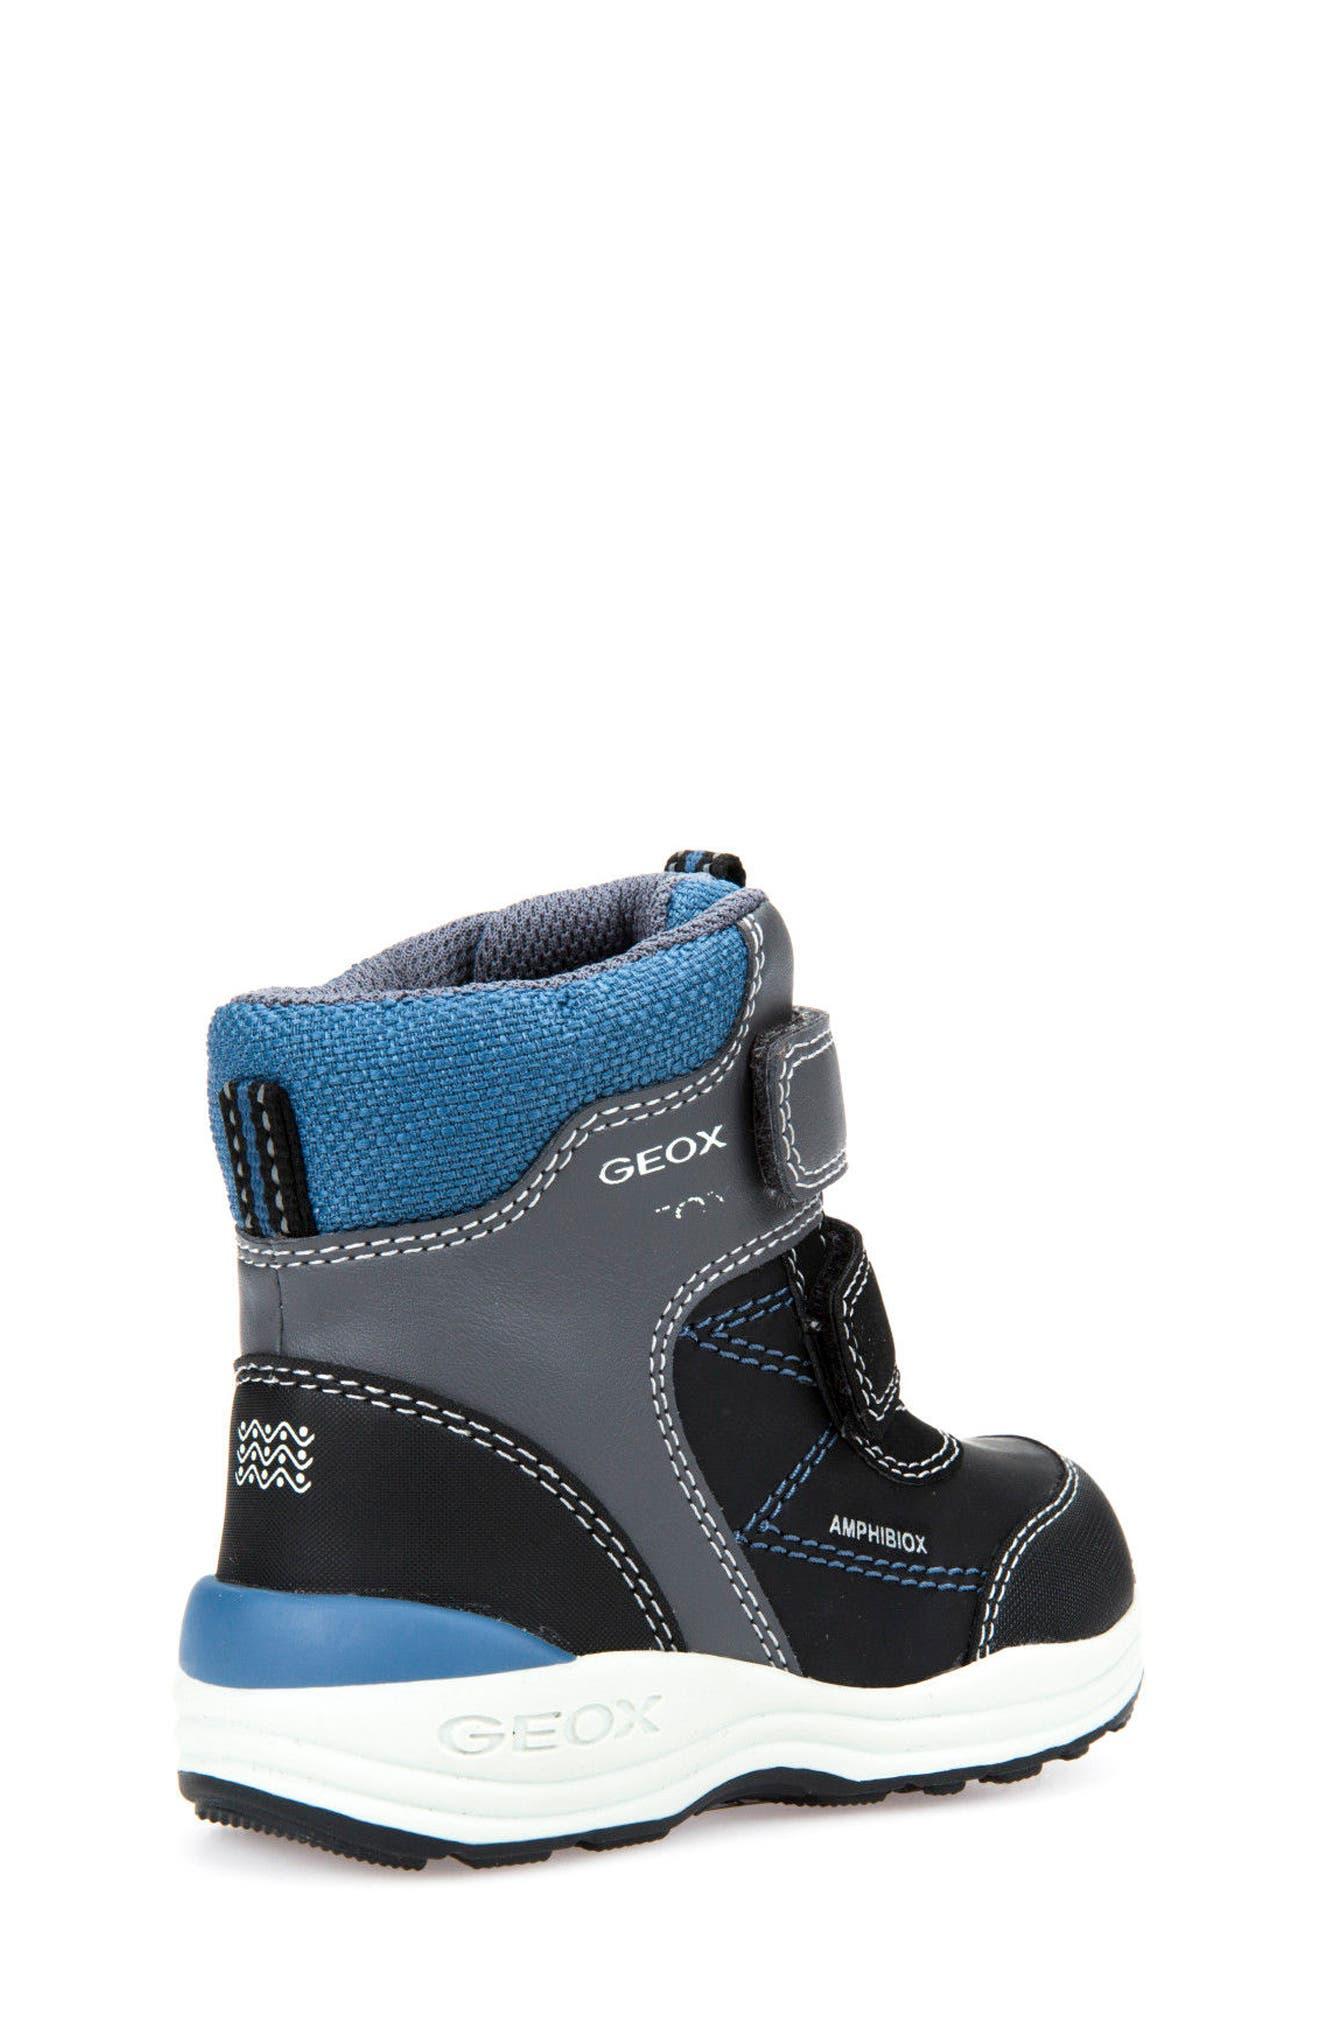 Gulp ABX Waterproof Boot,                             Alternate thumbnail 7, color,                             Dark Grey/ Avio